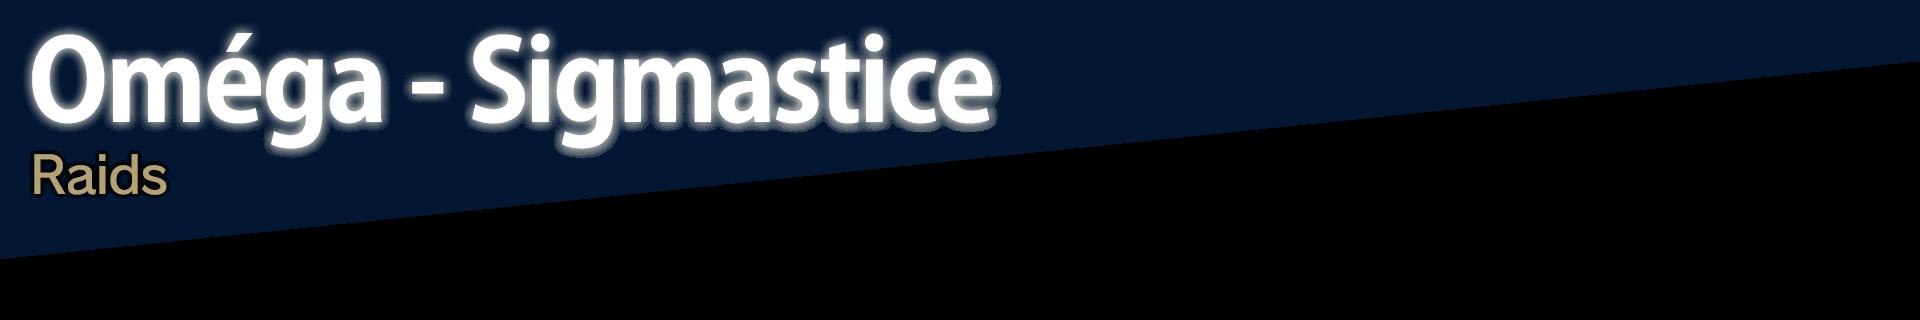 Oméga - Sigmastice